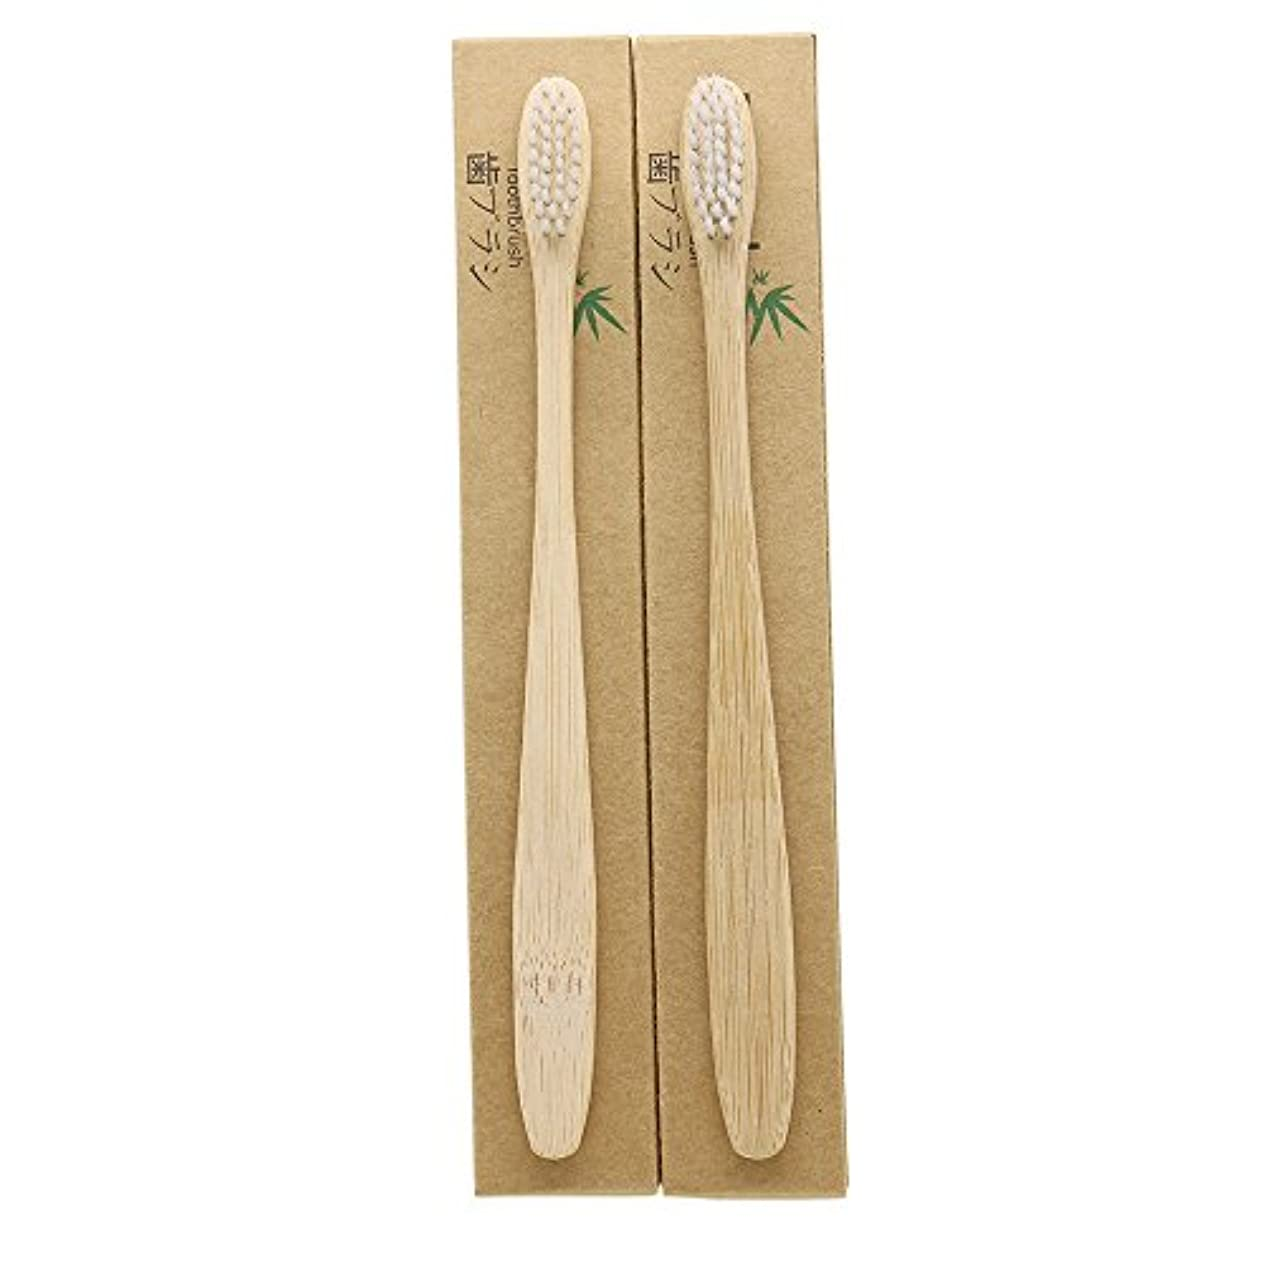 N-amboo 竹製耐久度高い 歯ブラシ 2本入り セット エコ ヘッド小さい 白い